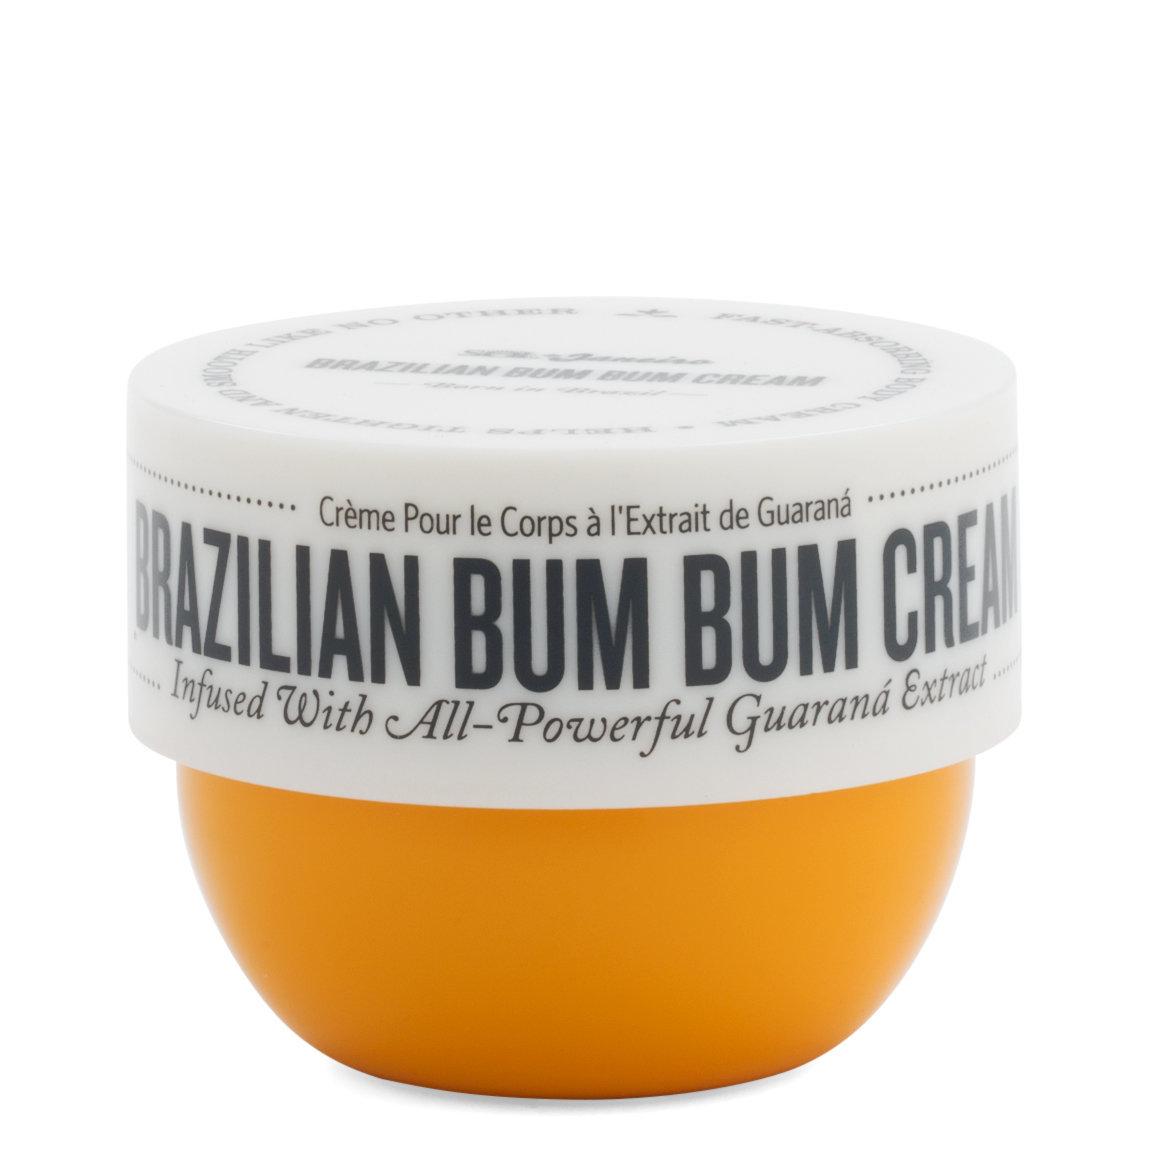 Sol de Janeiro Brazilian Bum Bum Cream 2.5 oz product swatch.